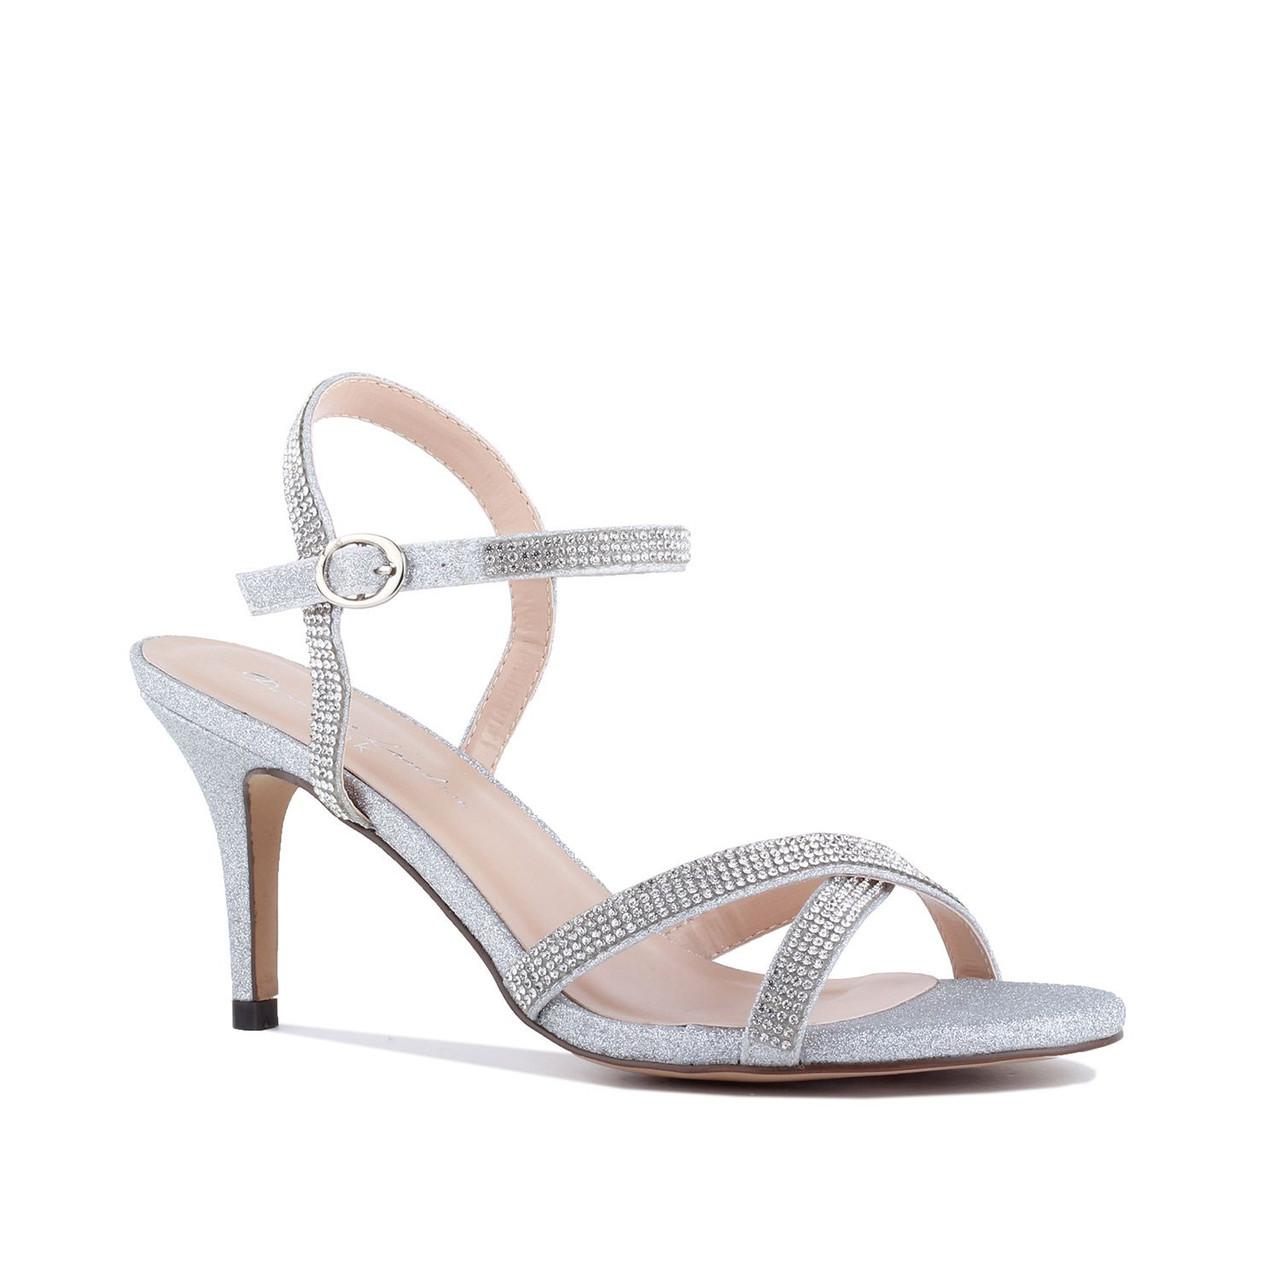 Paradox London Riva Silver - Pink Collection - Standard Medium Size